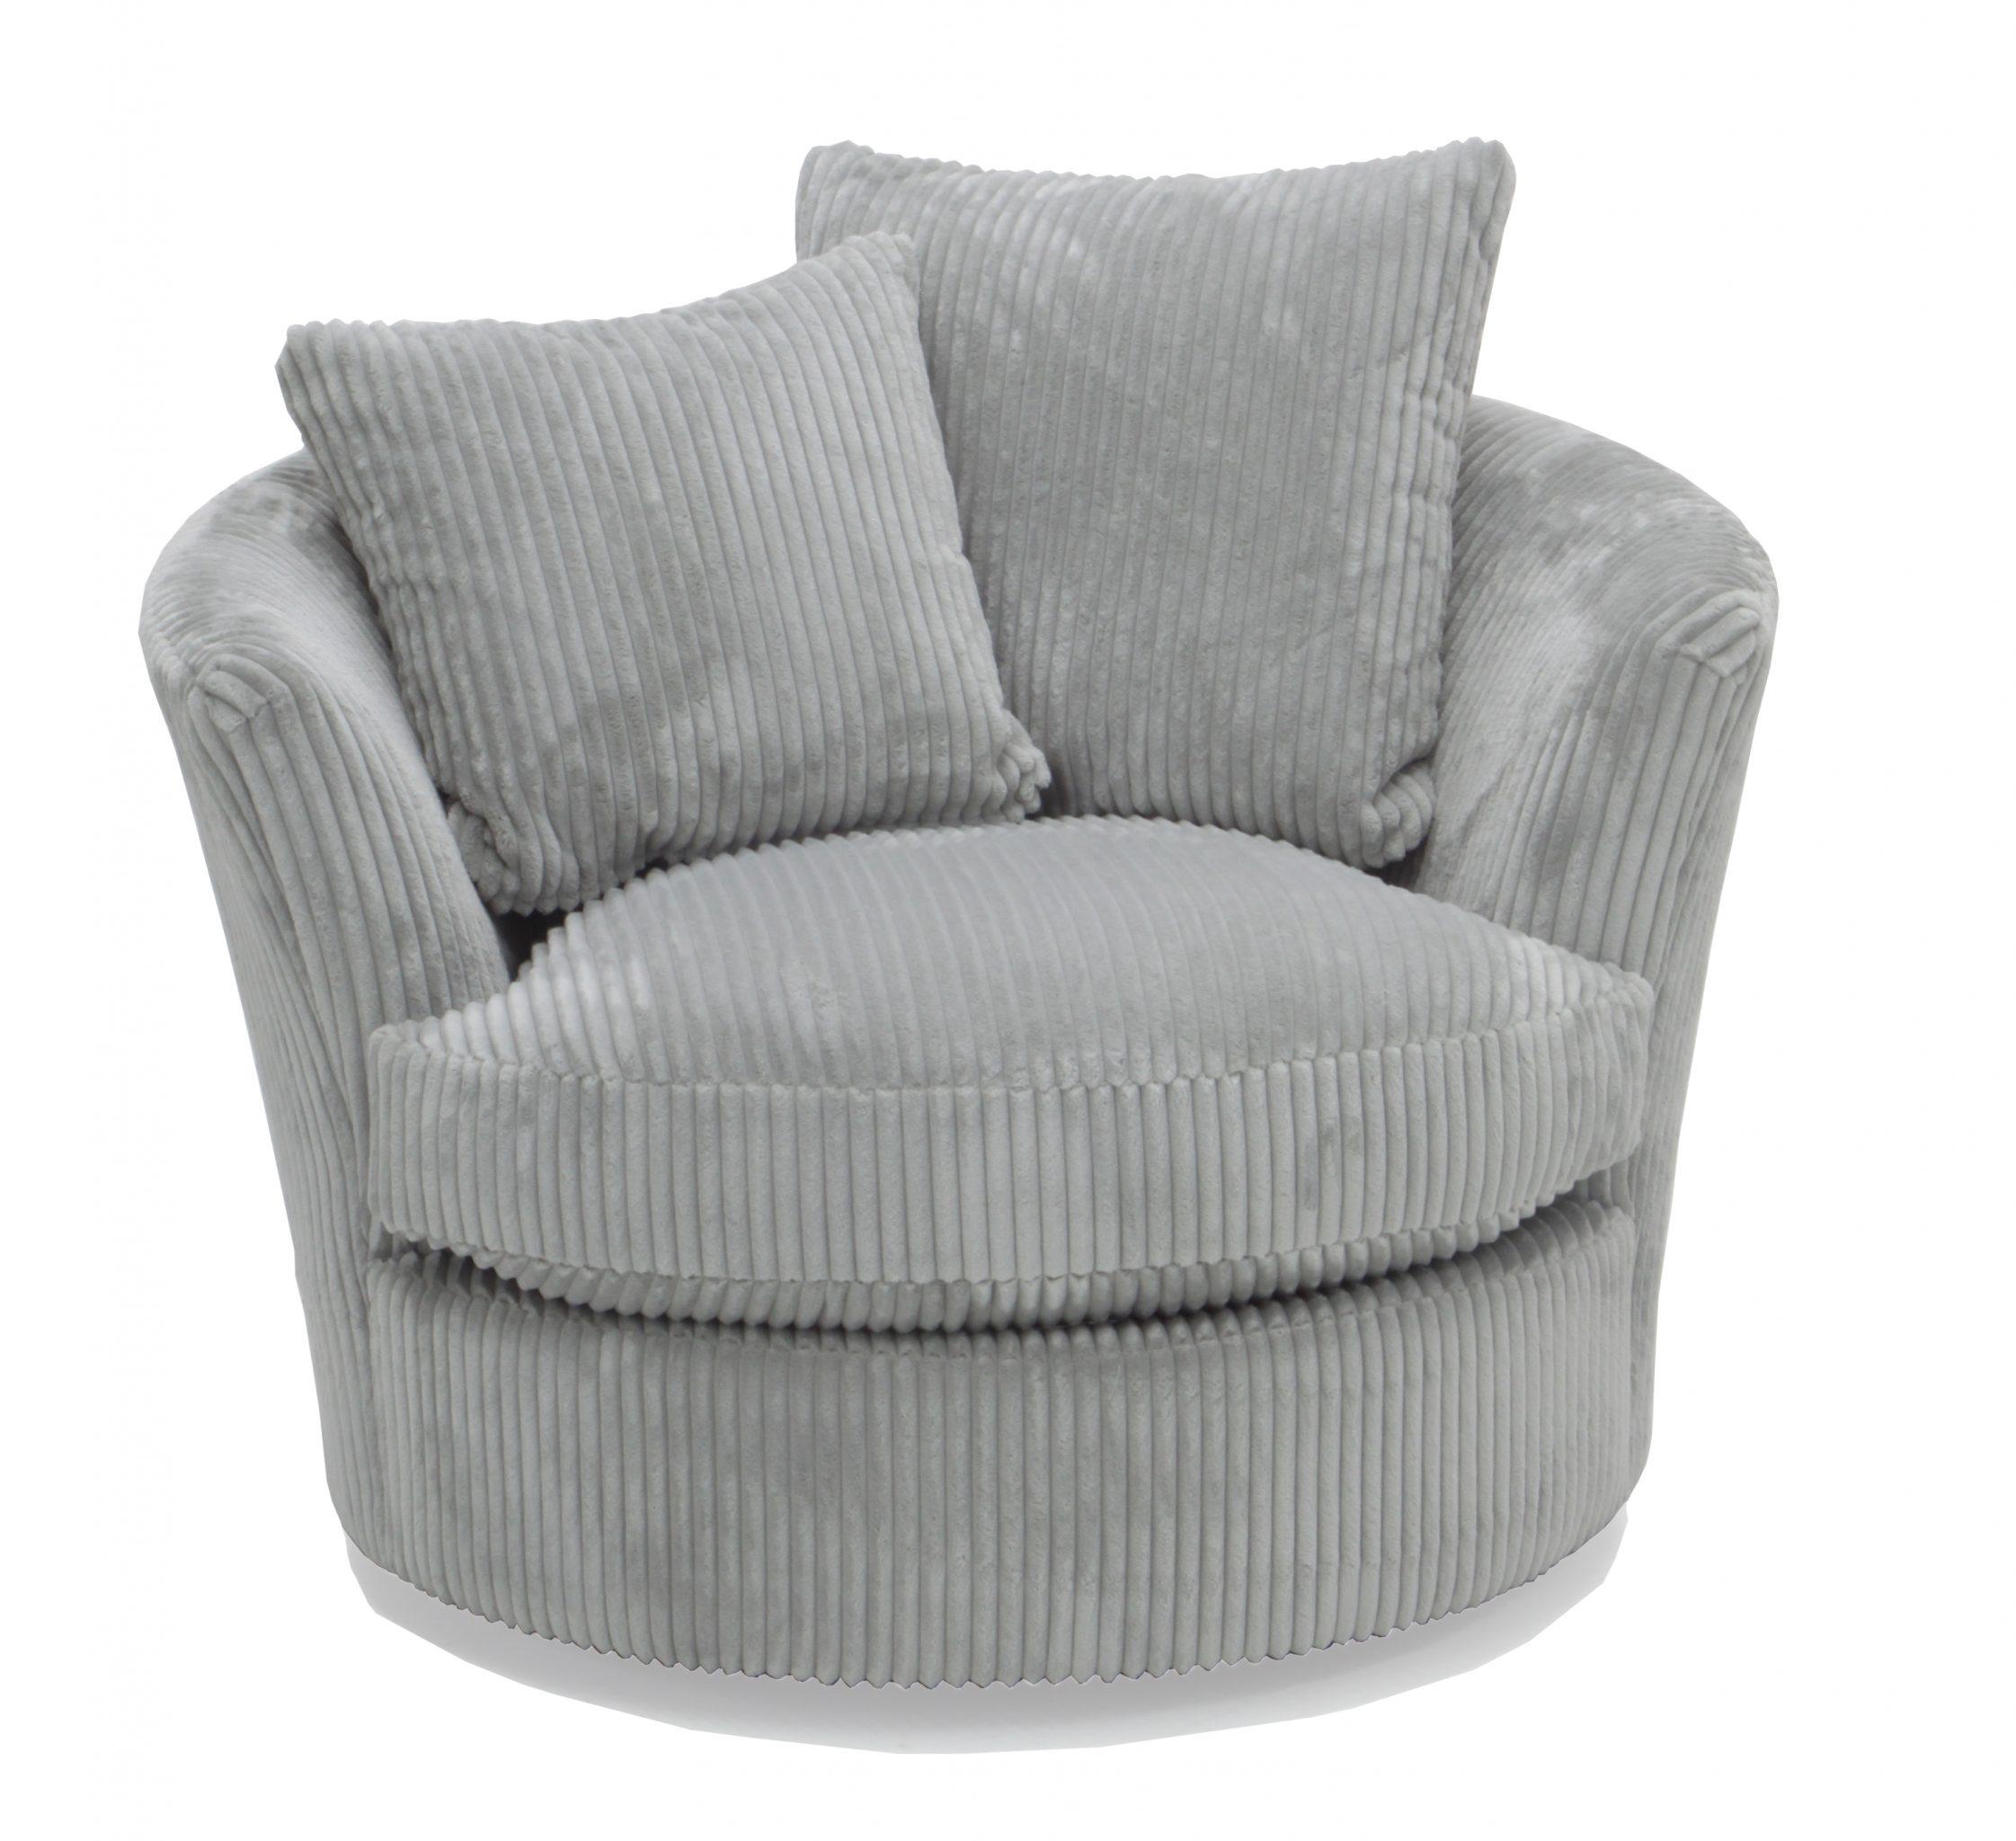 Luxury Snuggle Chair Rtty1 Com Rtty1 Com